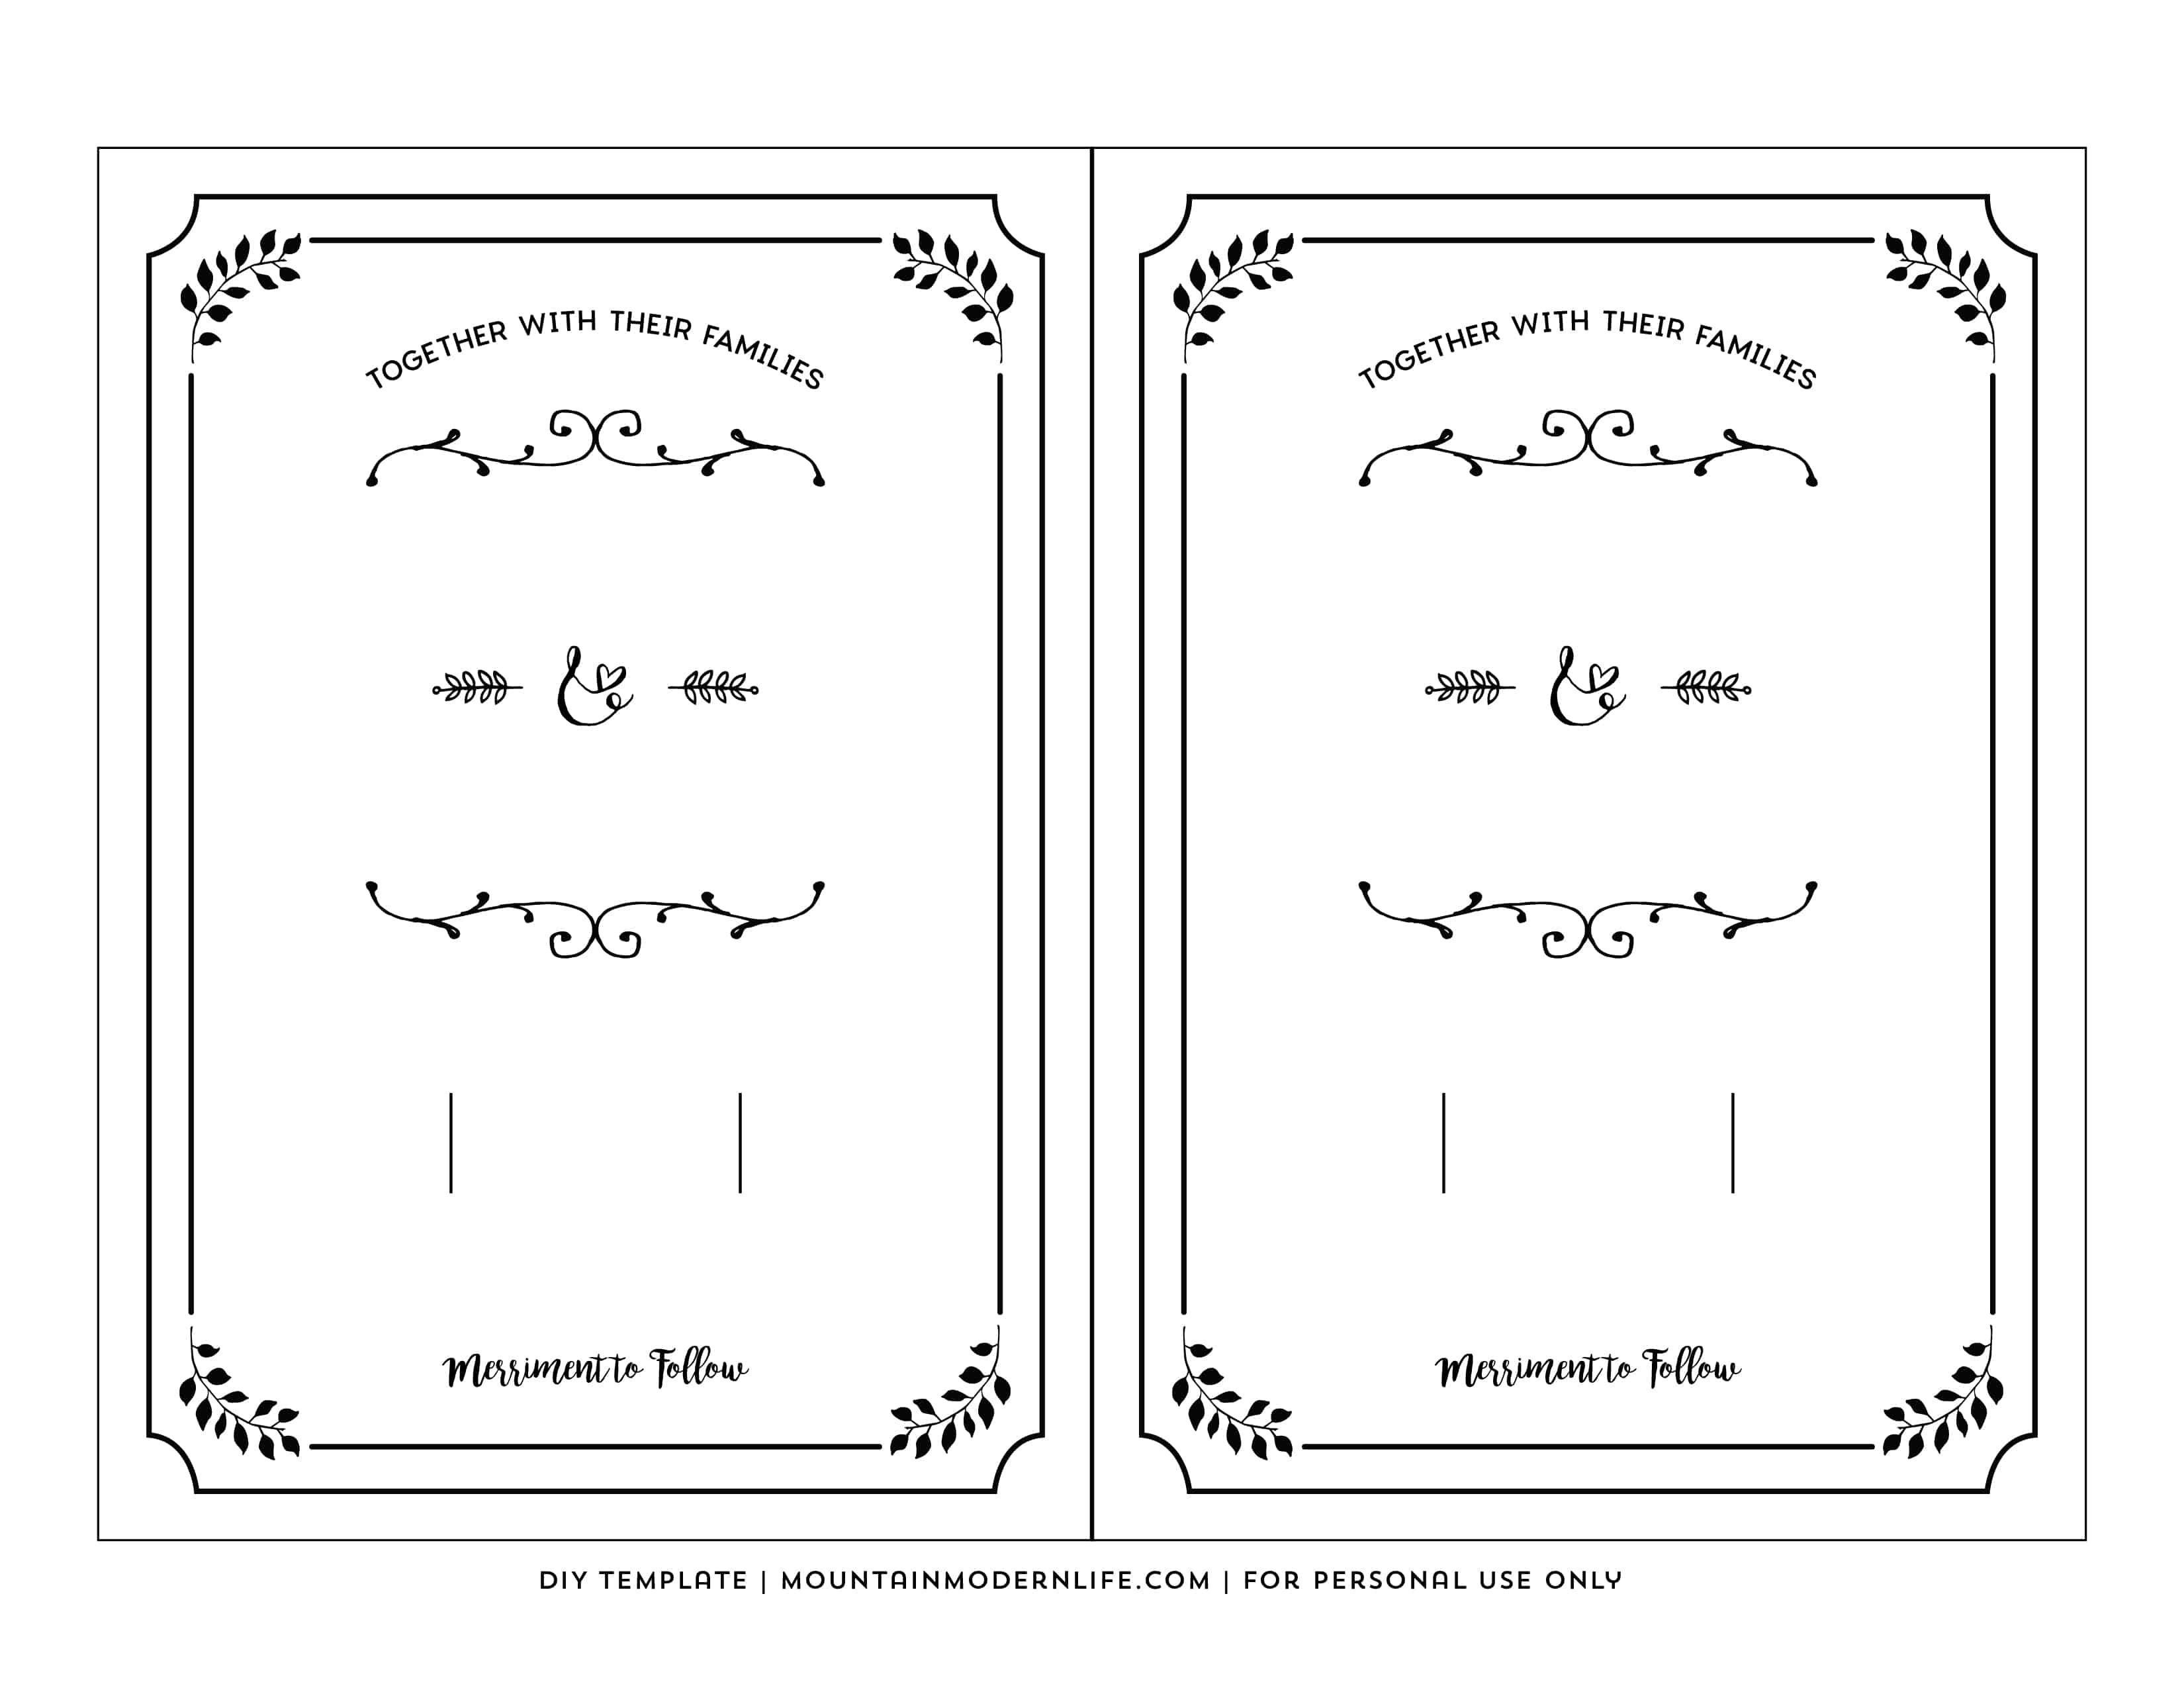 Free Printable Wedding Invitation Template - Free Printable Wedding Invitations With Photo